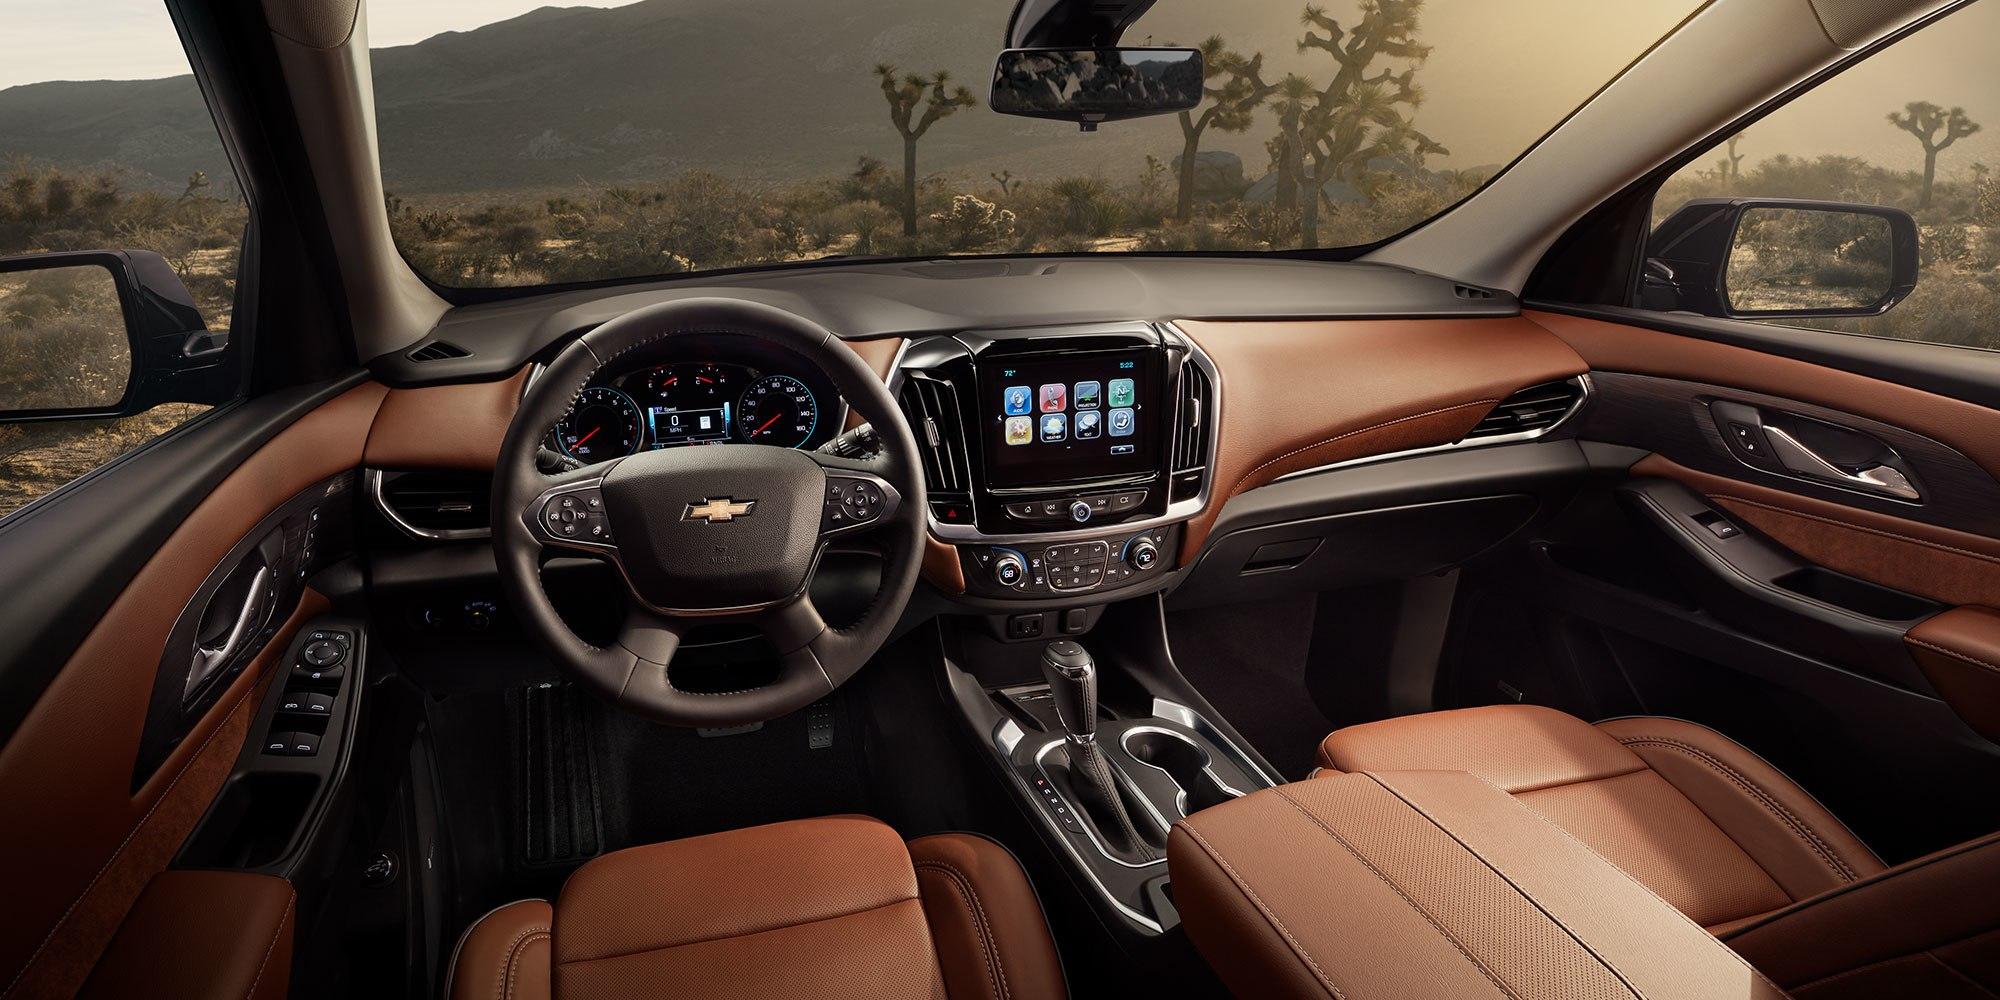 2019 Chevrolet Traverse Cockpit